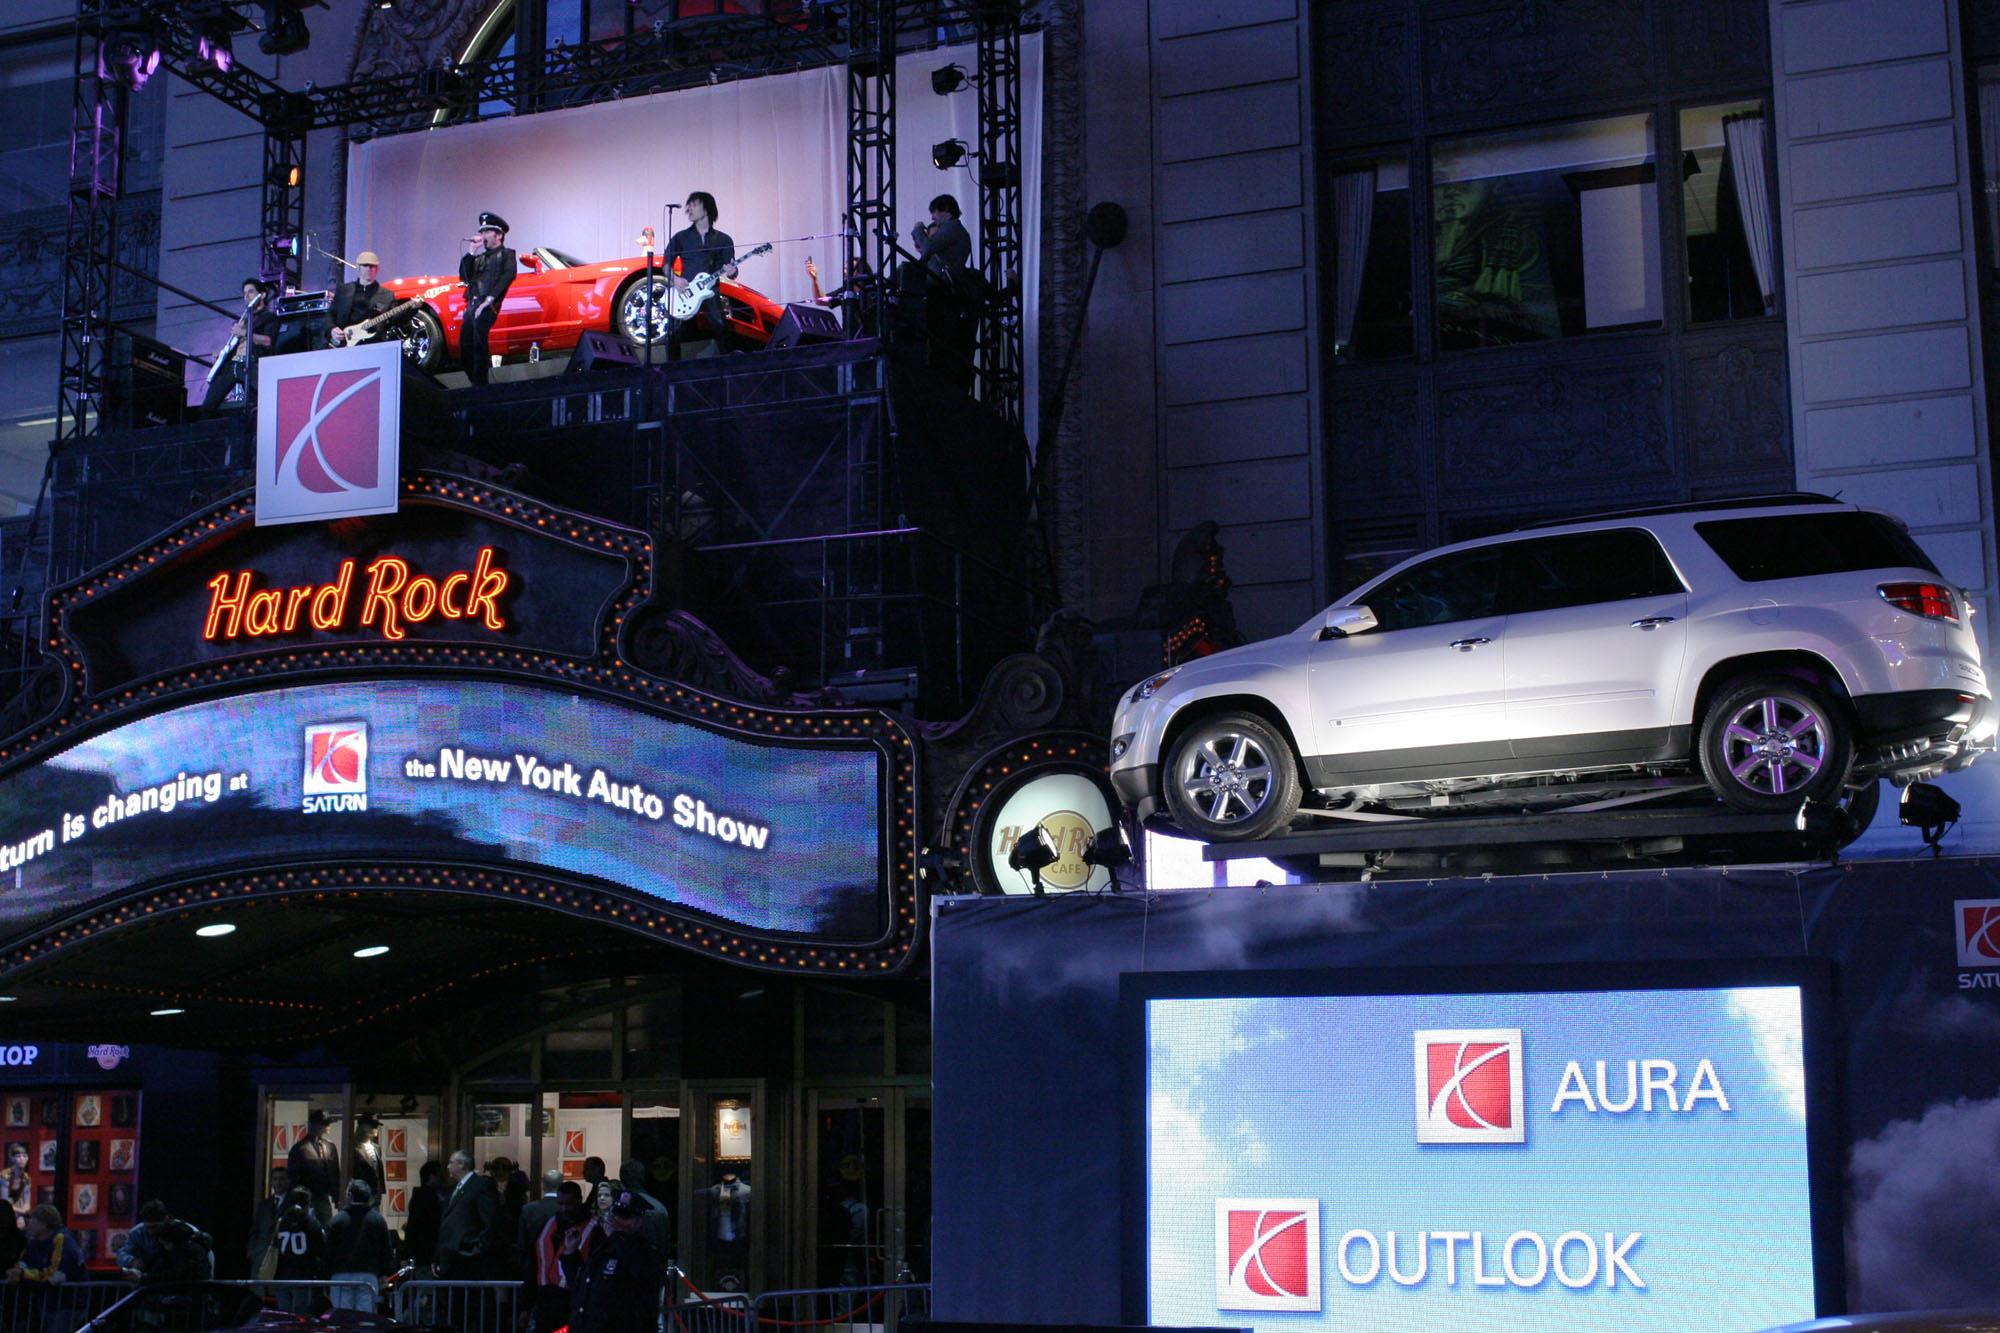 [GM News] Official Redline Announcement [Merge]-nysaturncampfreddy01.jpg